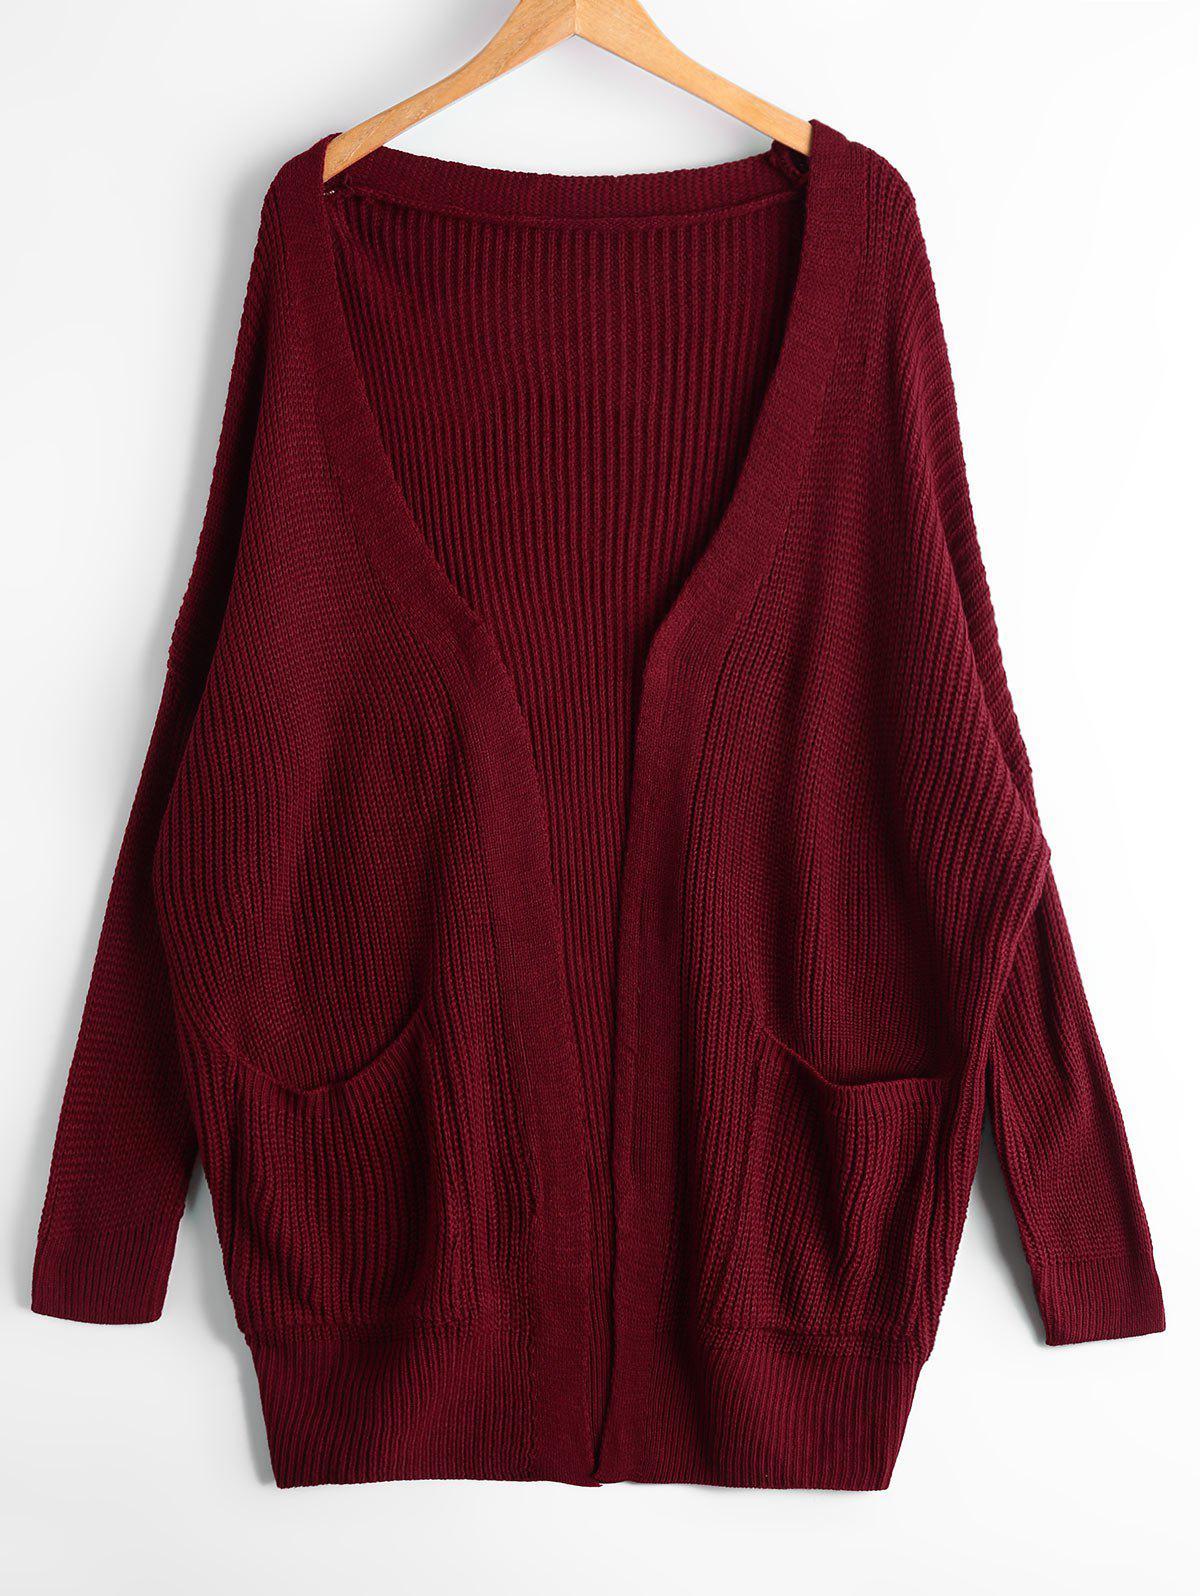 Cardigan en coton ouvert ouvert avec poches